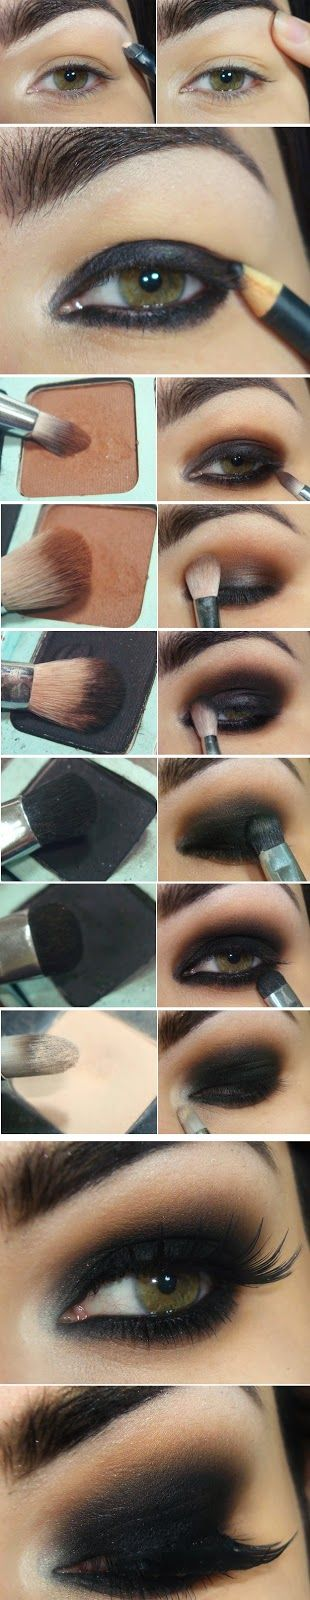 Tutorial de ojos ahumados en negro super famoso de LuLus Makeup Fashion.